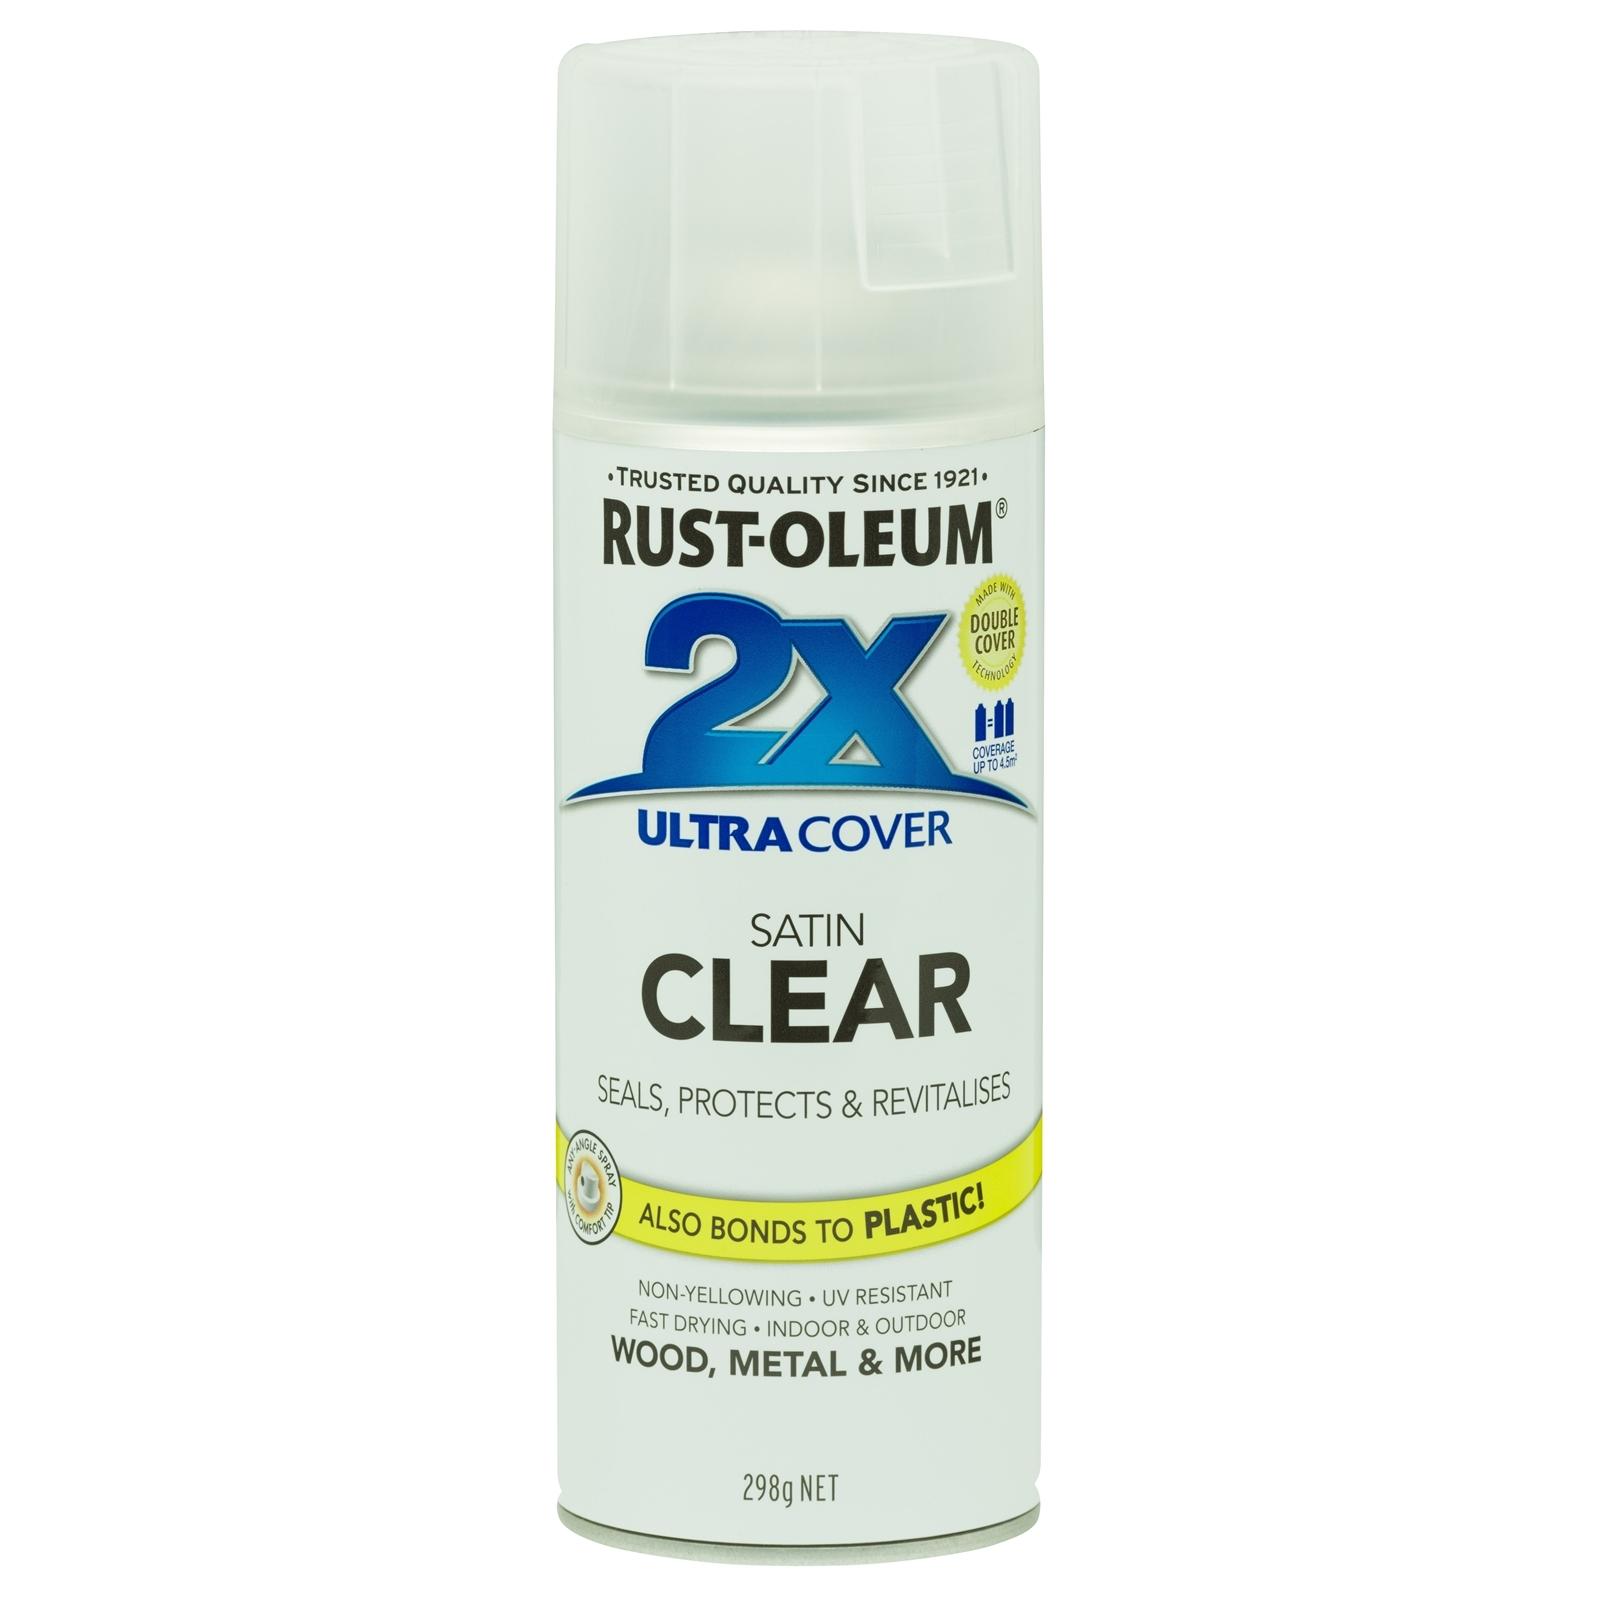 Rust-Oleum 298g 2X Ultra Cover Satin Clear Spray Paint